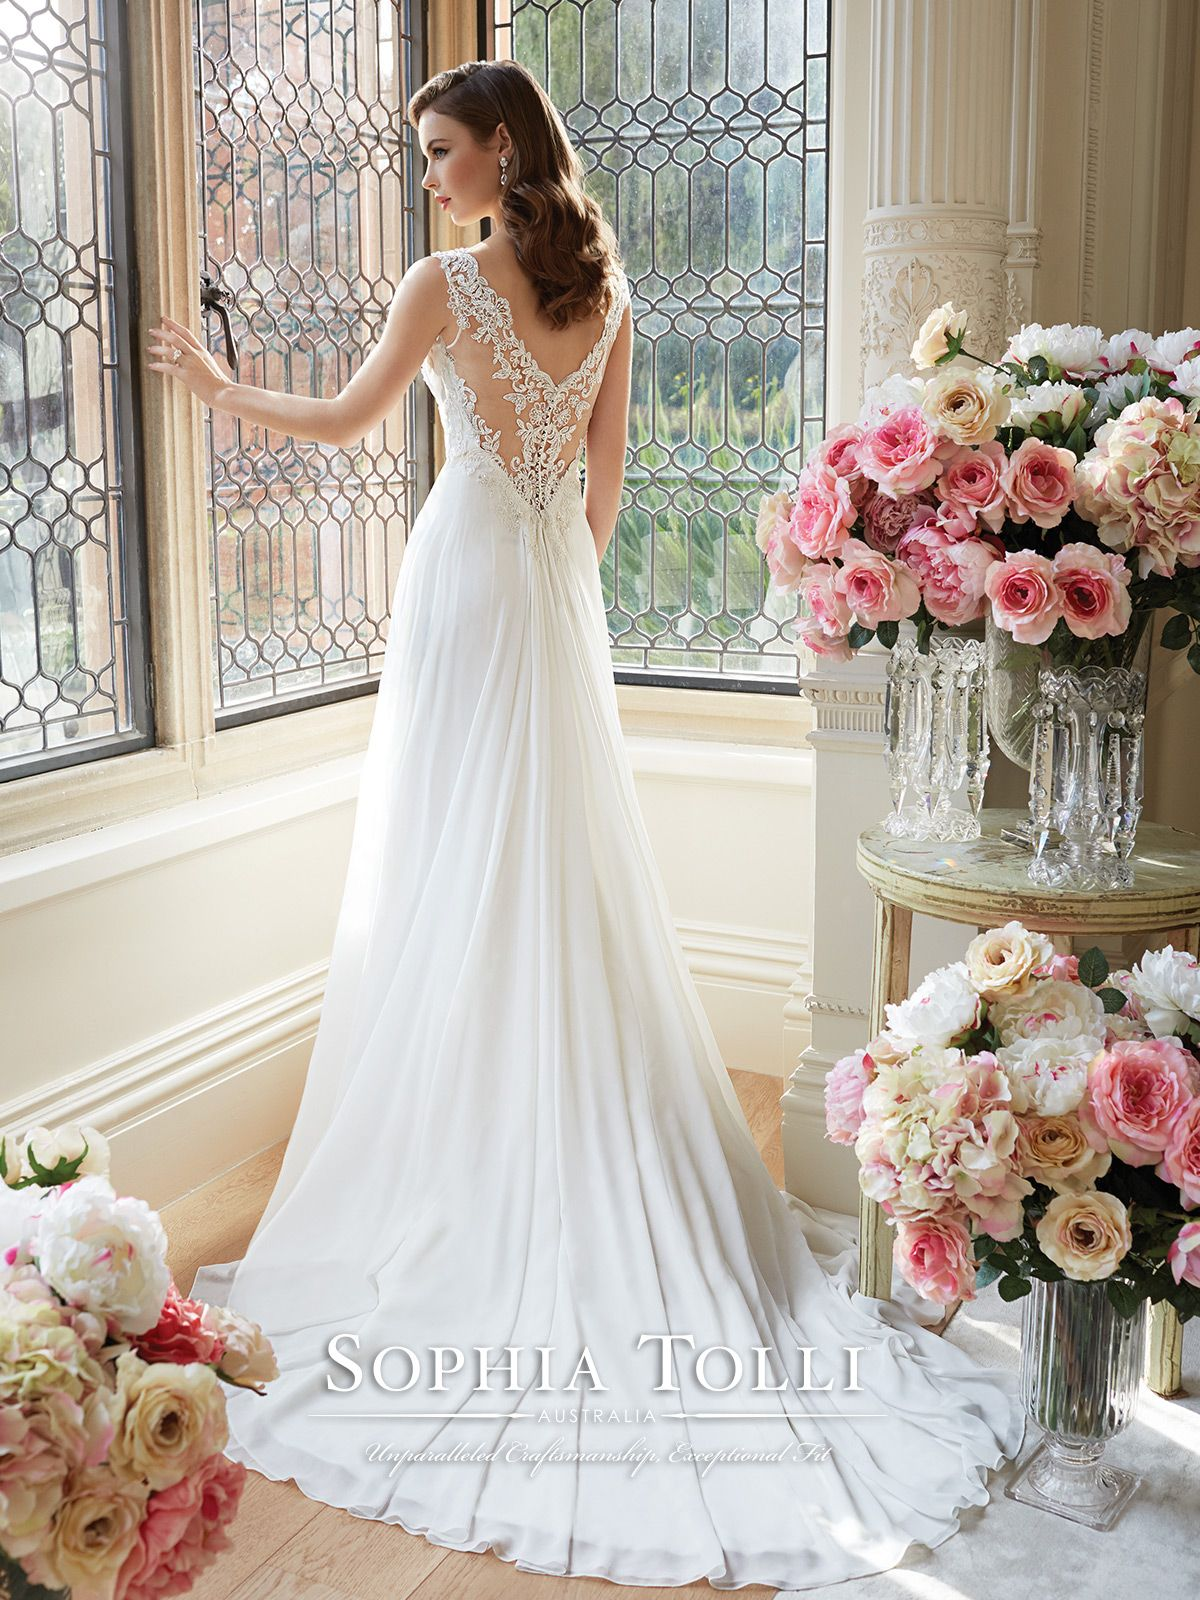 Sophia Tolli Augusta Wedding Dresses Sophia Tolli Wedding Dresses Lace Back Wedding Dress